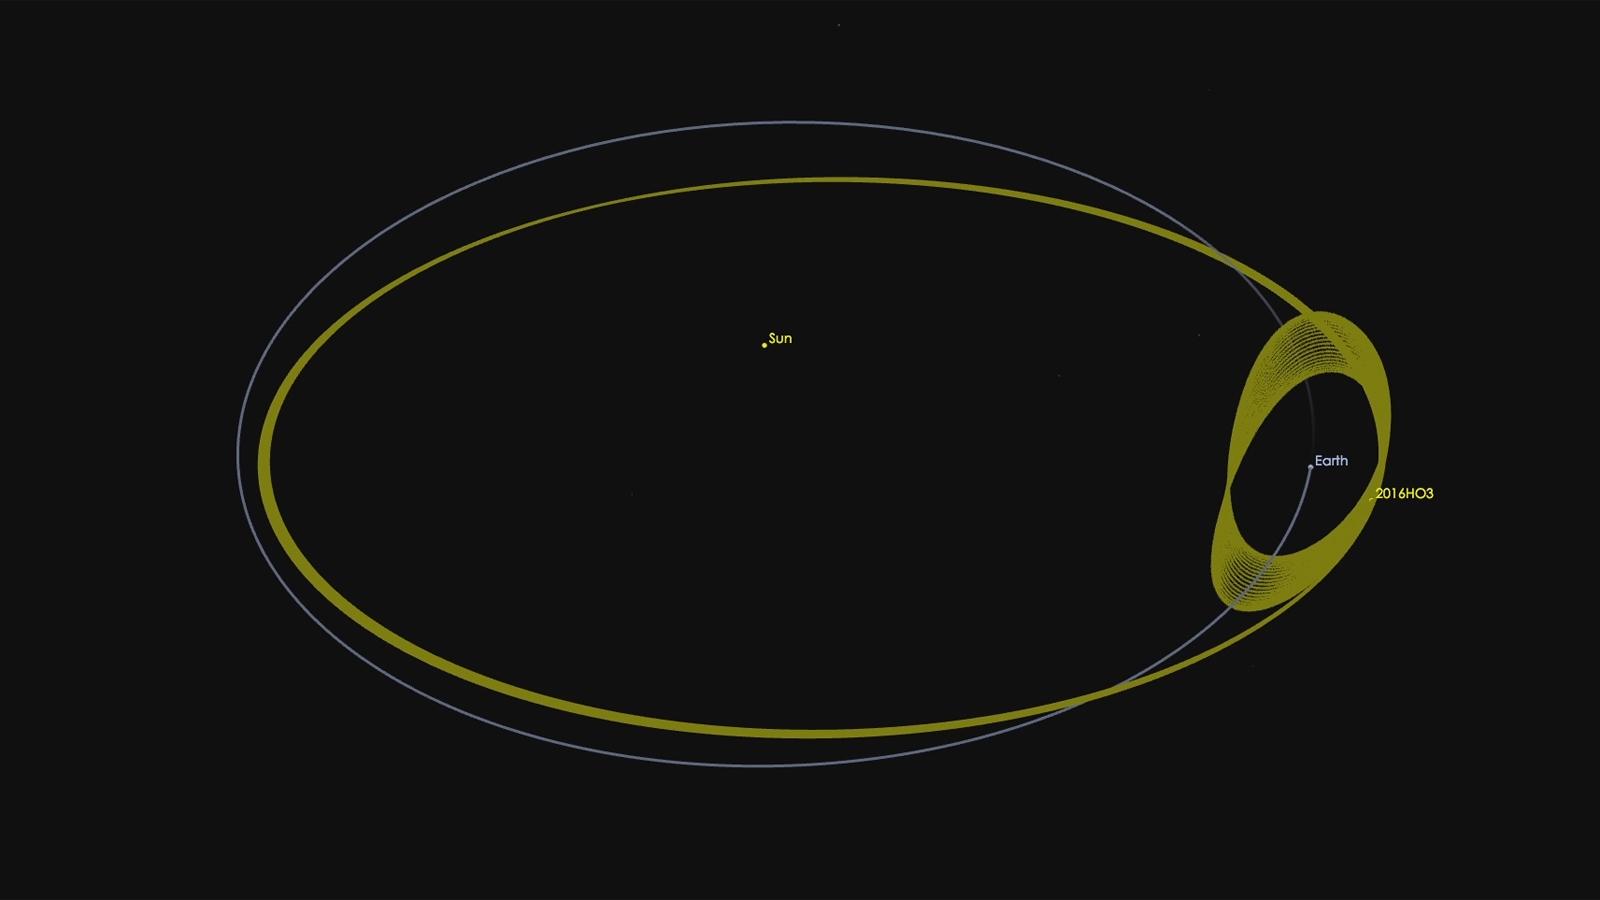 Científicos de la NASA descubren que un asteroide 'nos persigue'